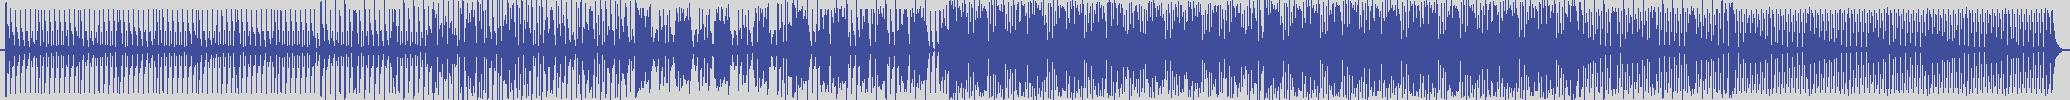 workin [WRK007] Peebee - Get Down [The Beat Mix] audio wave form